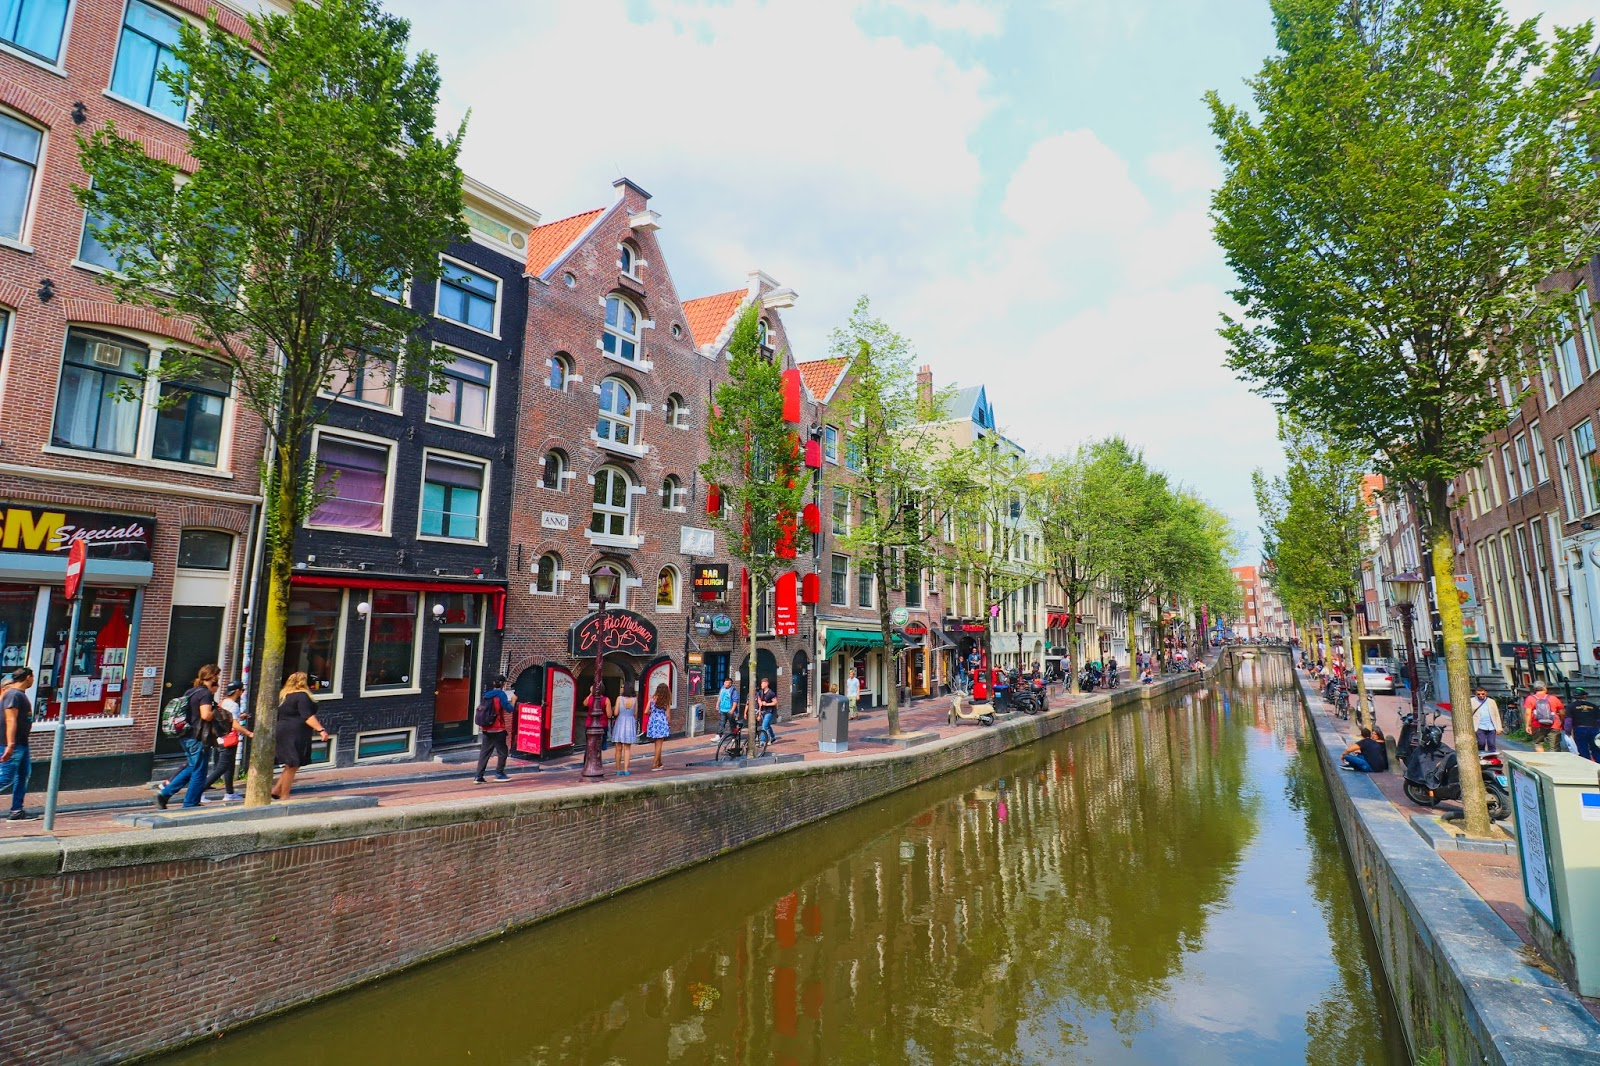 kanał, podróże, eurotrip, holandia